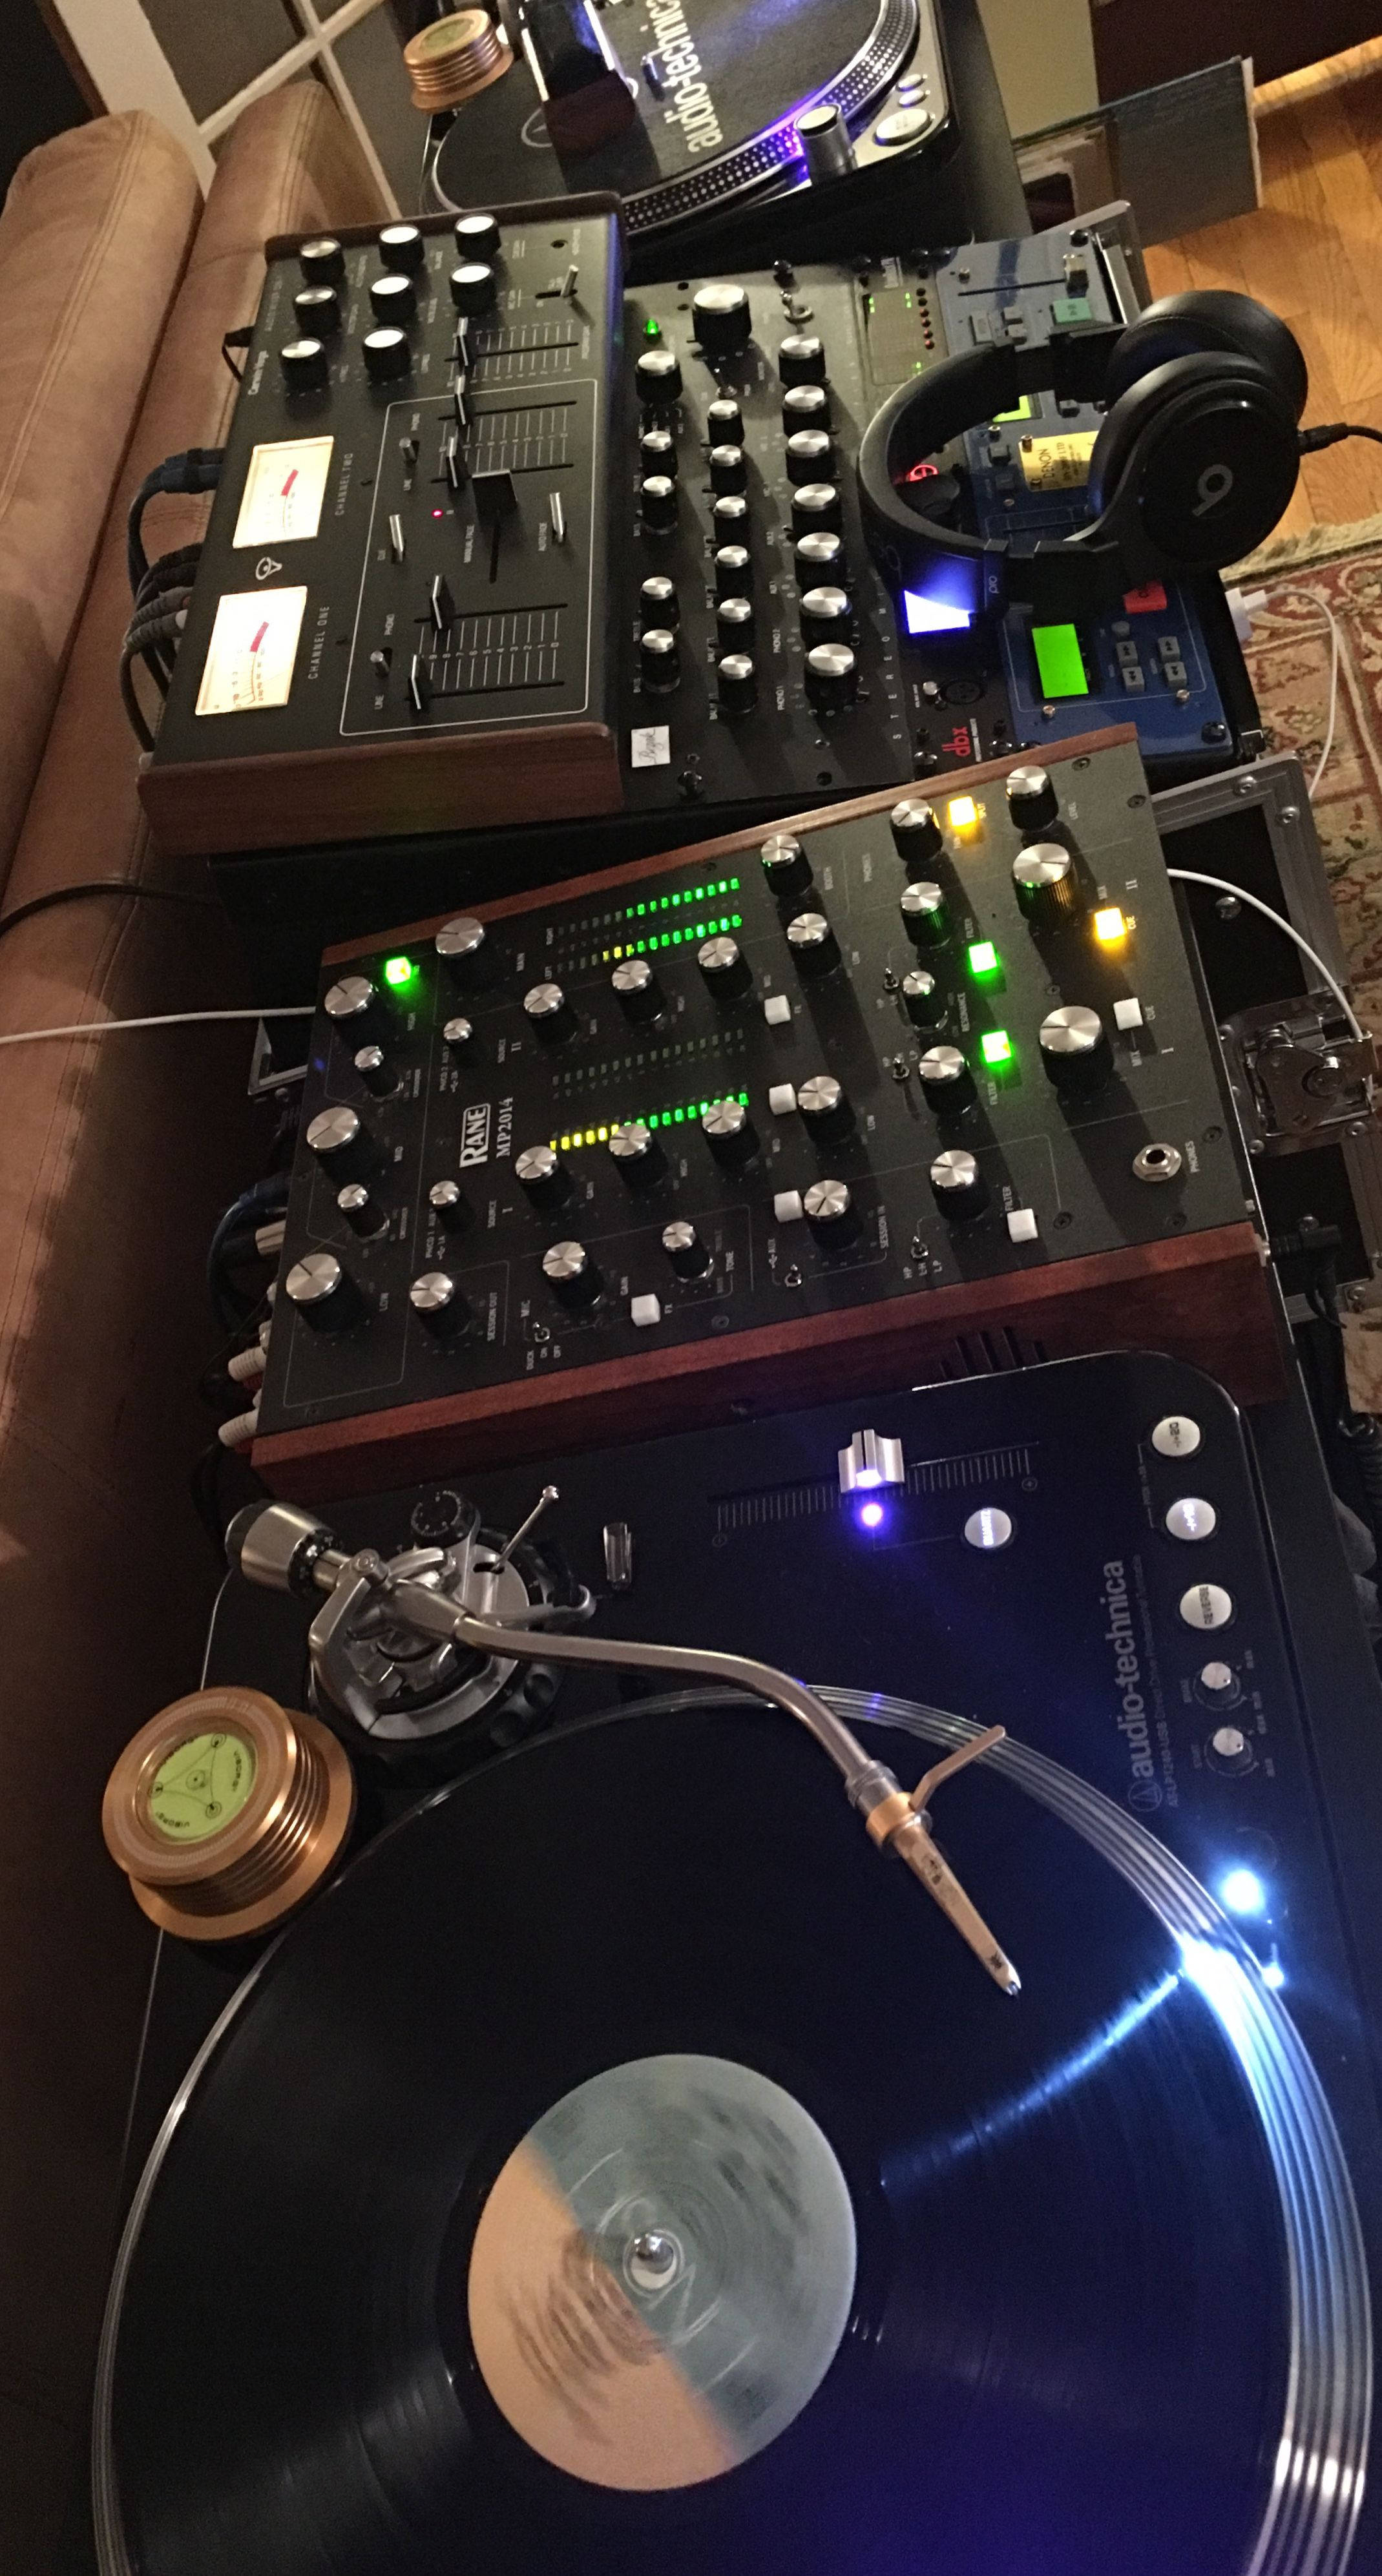 Pin By Rafa On Bozak In 2019 Dj Equipment Music Dj Setup